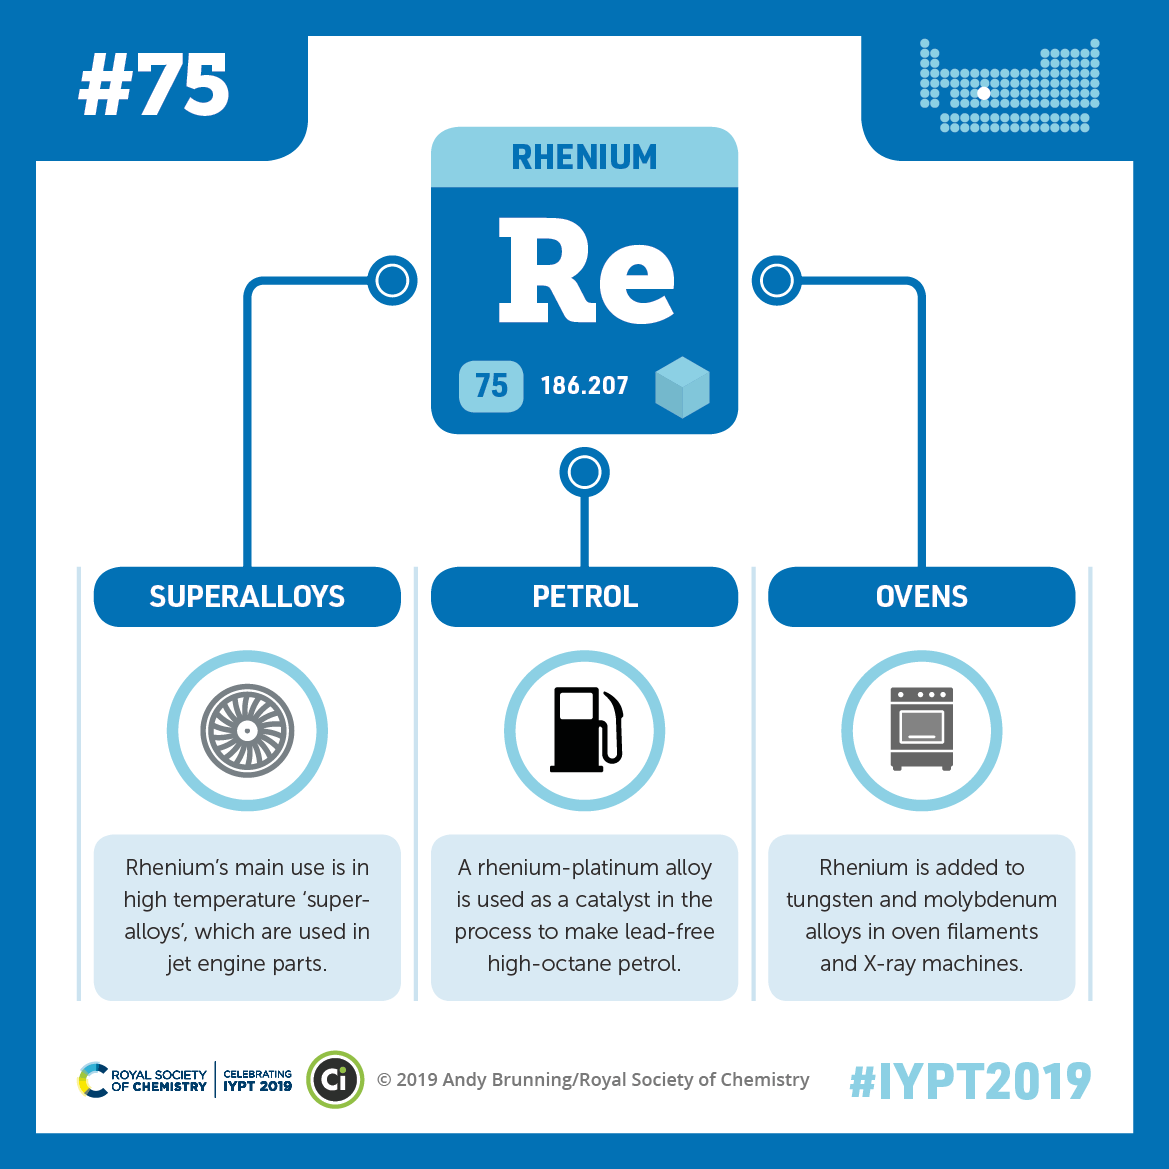 IYPT 2019 Elements 075: Rhenium: Superalloys and making lead-free petrol